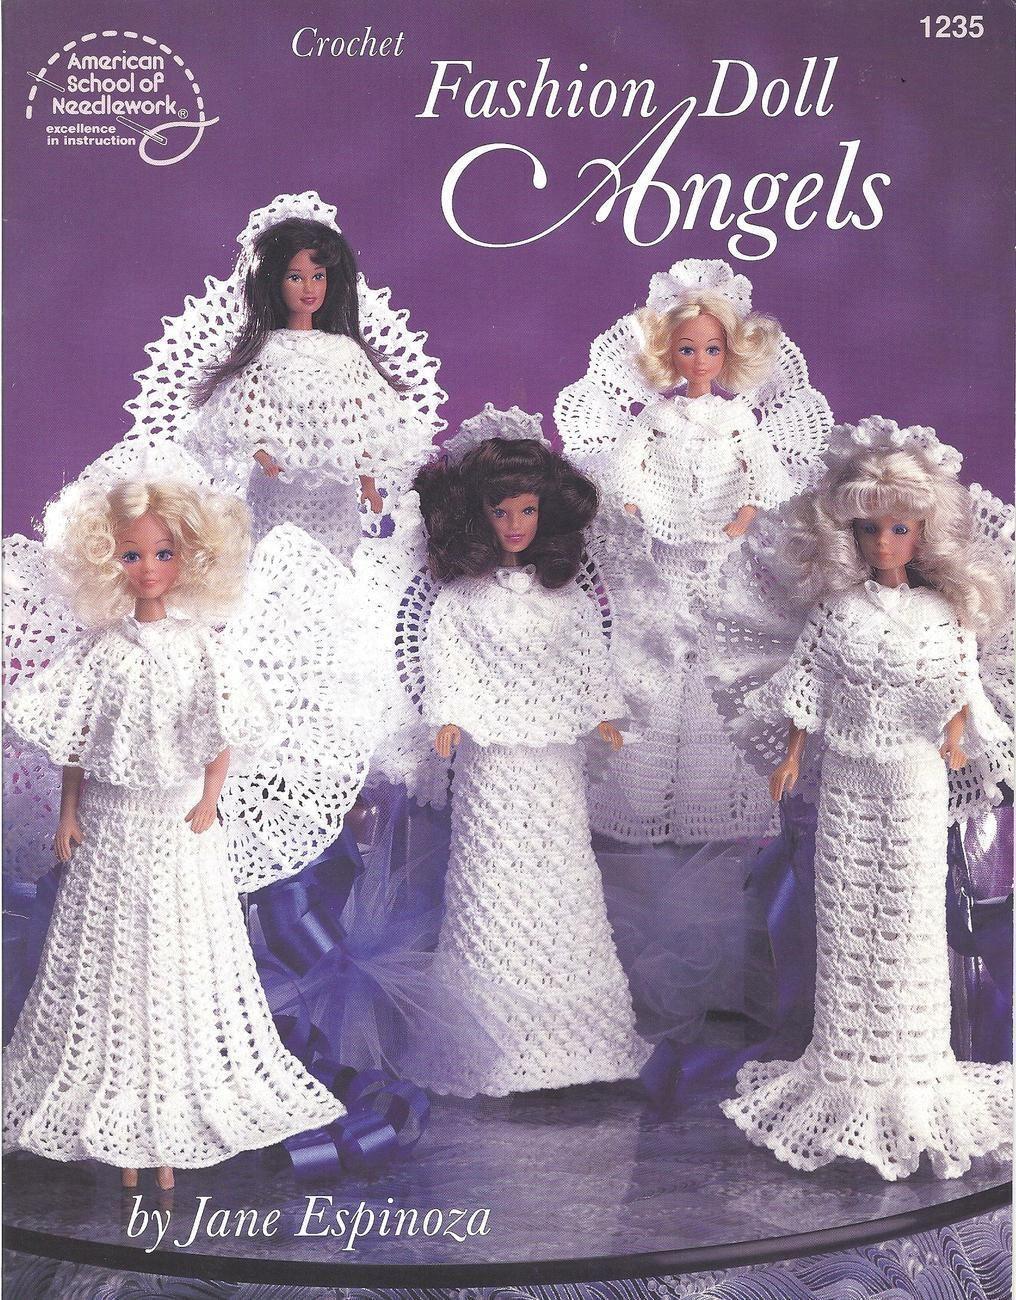 Crochet Pattern Book Crochet Fashion Doll Angels by American School ...